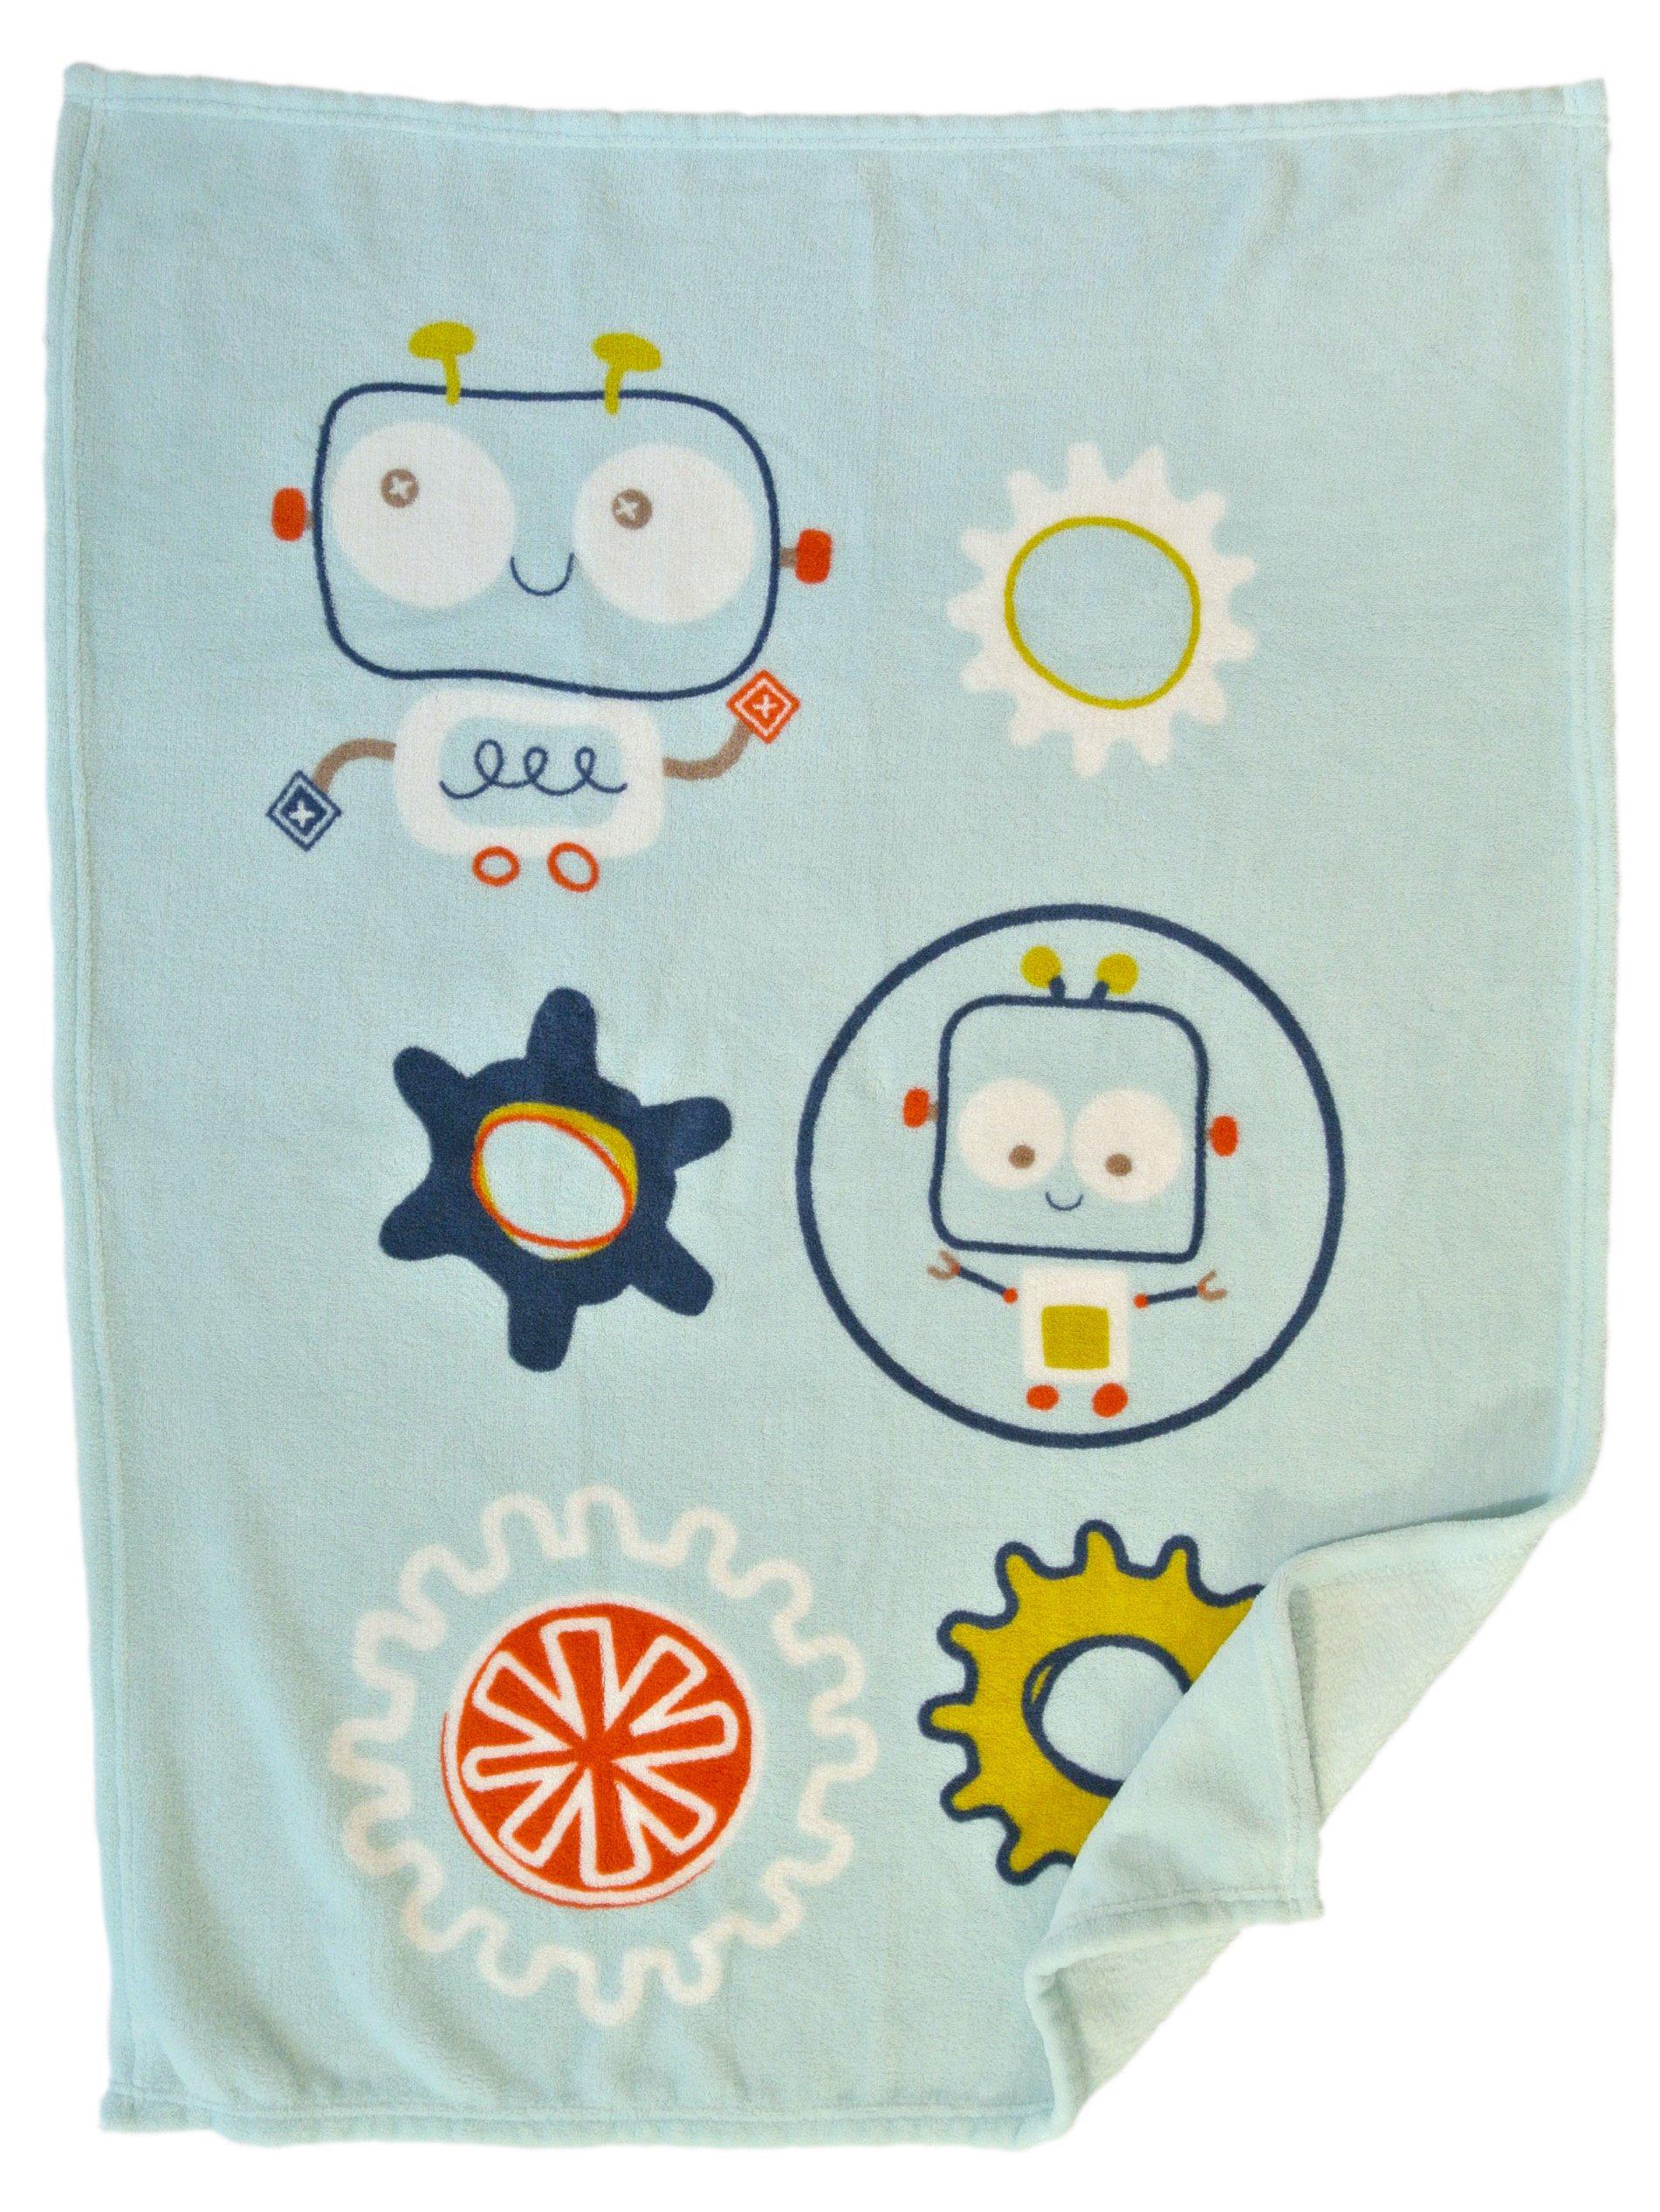 Baby Blanket (Robot) Super Soft Fleece Baby Boy's Blanket/Cozy blanket/Crib To Toddler/Registry Gift For Boy and Girl/Super soft